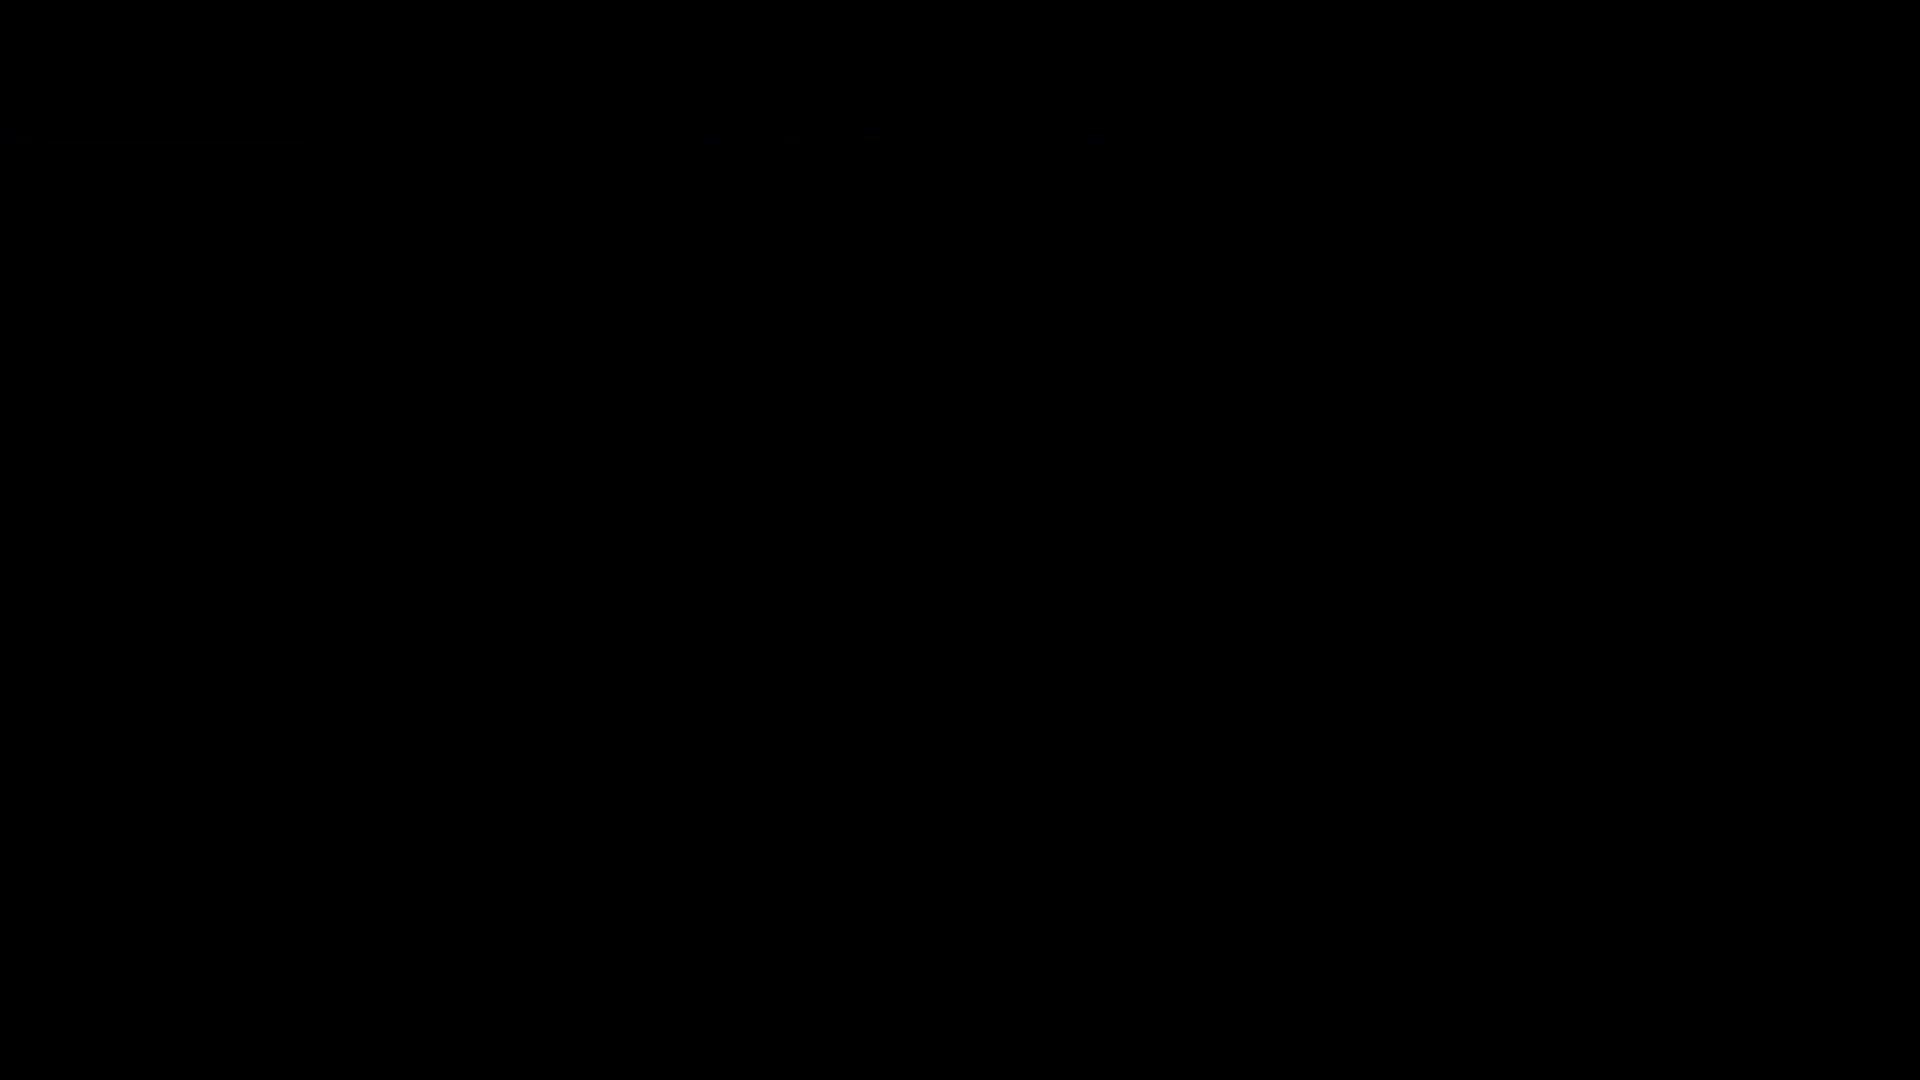 Aafflnme